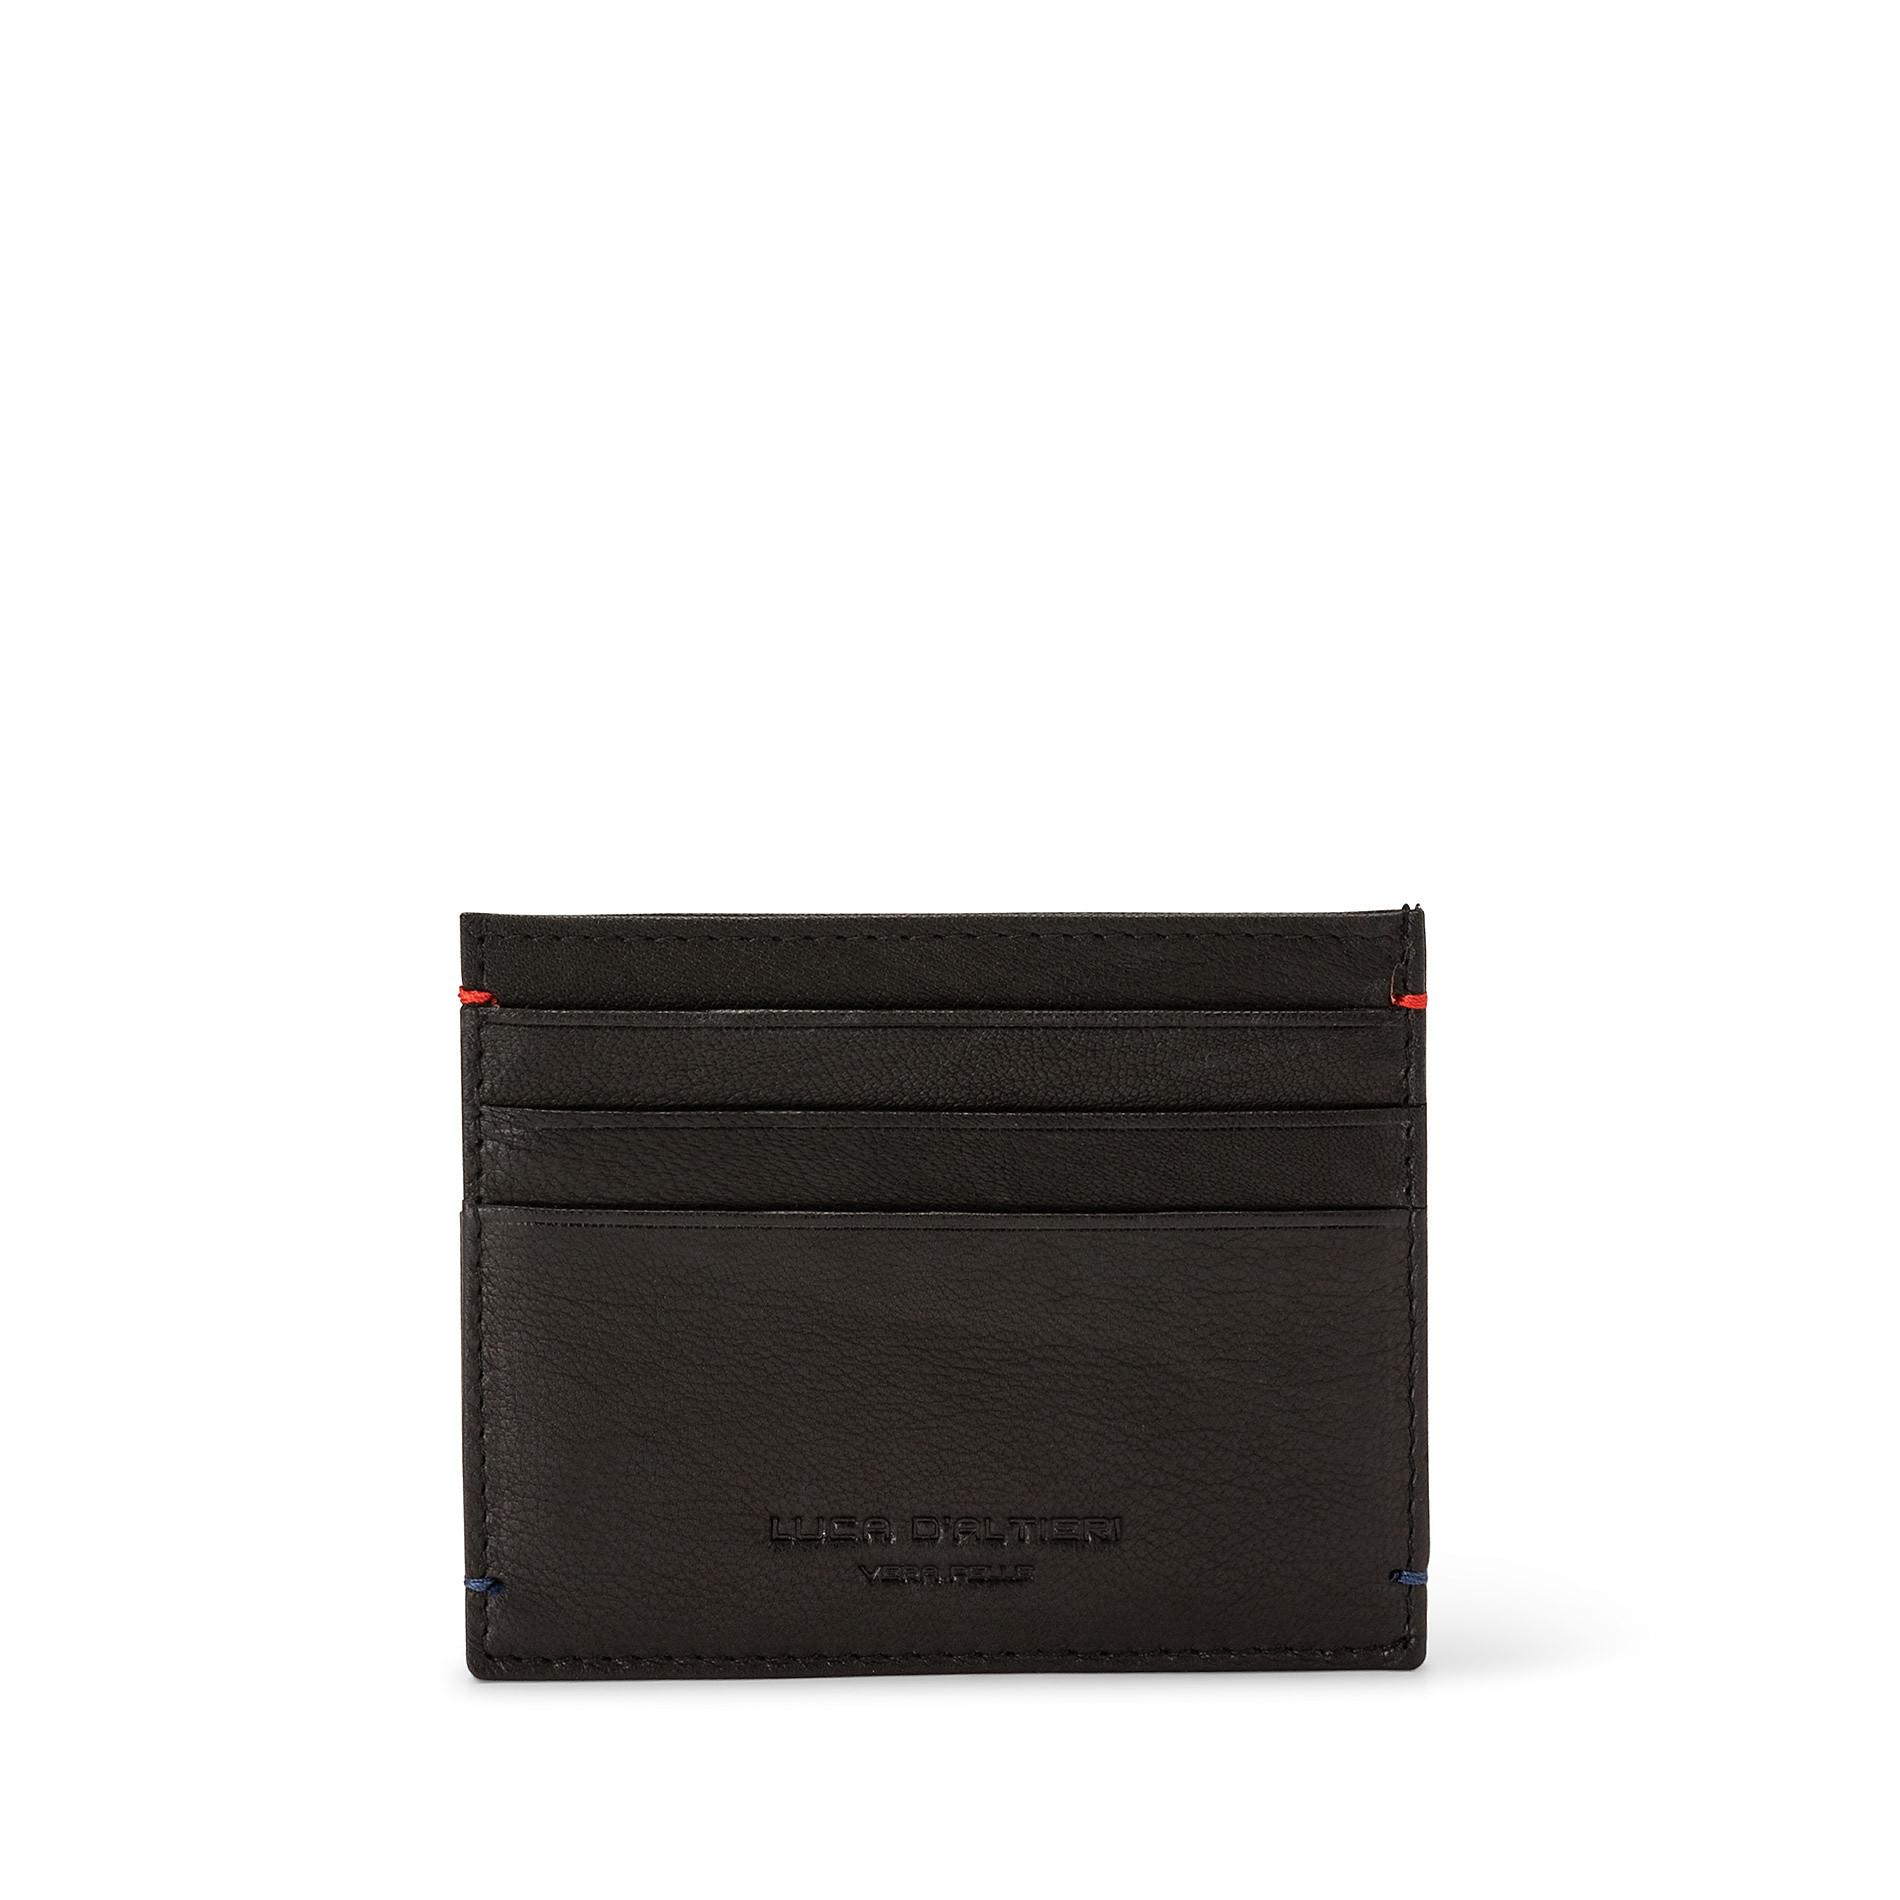 Porta carte di credito in pelle Luca D'Altieri, Nero, large image number 0